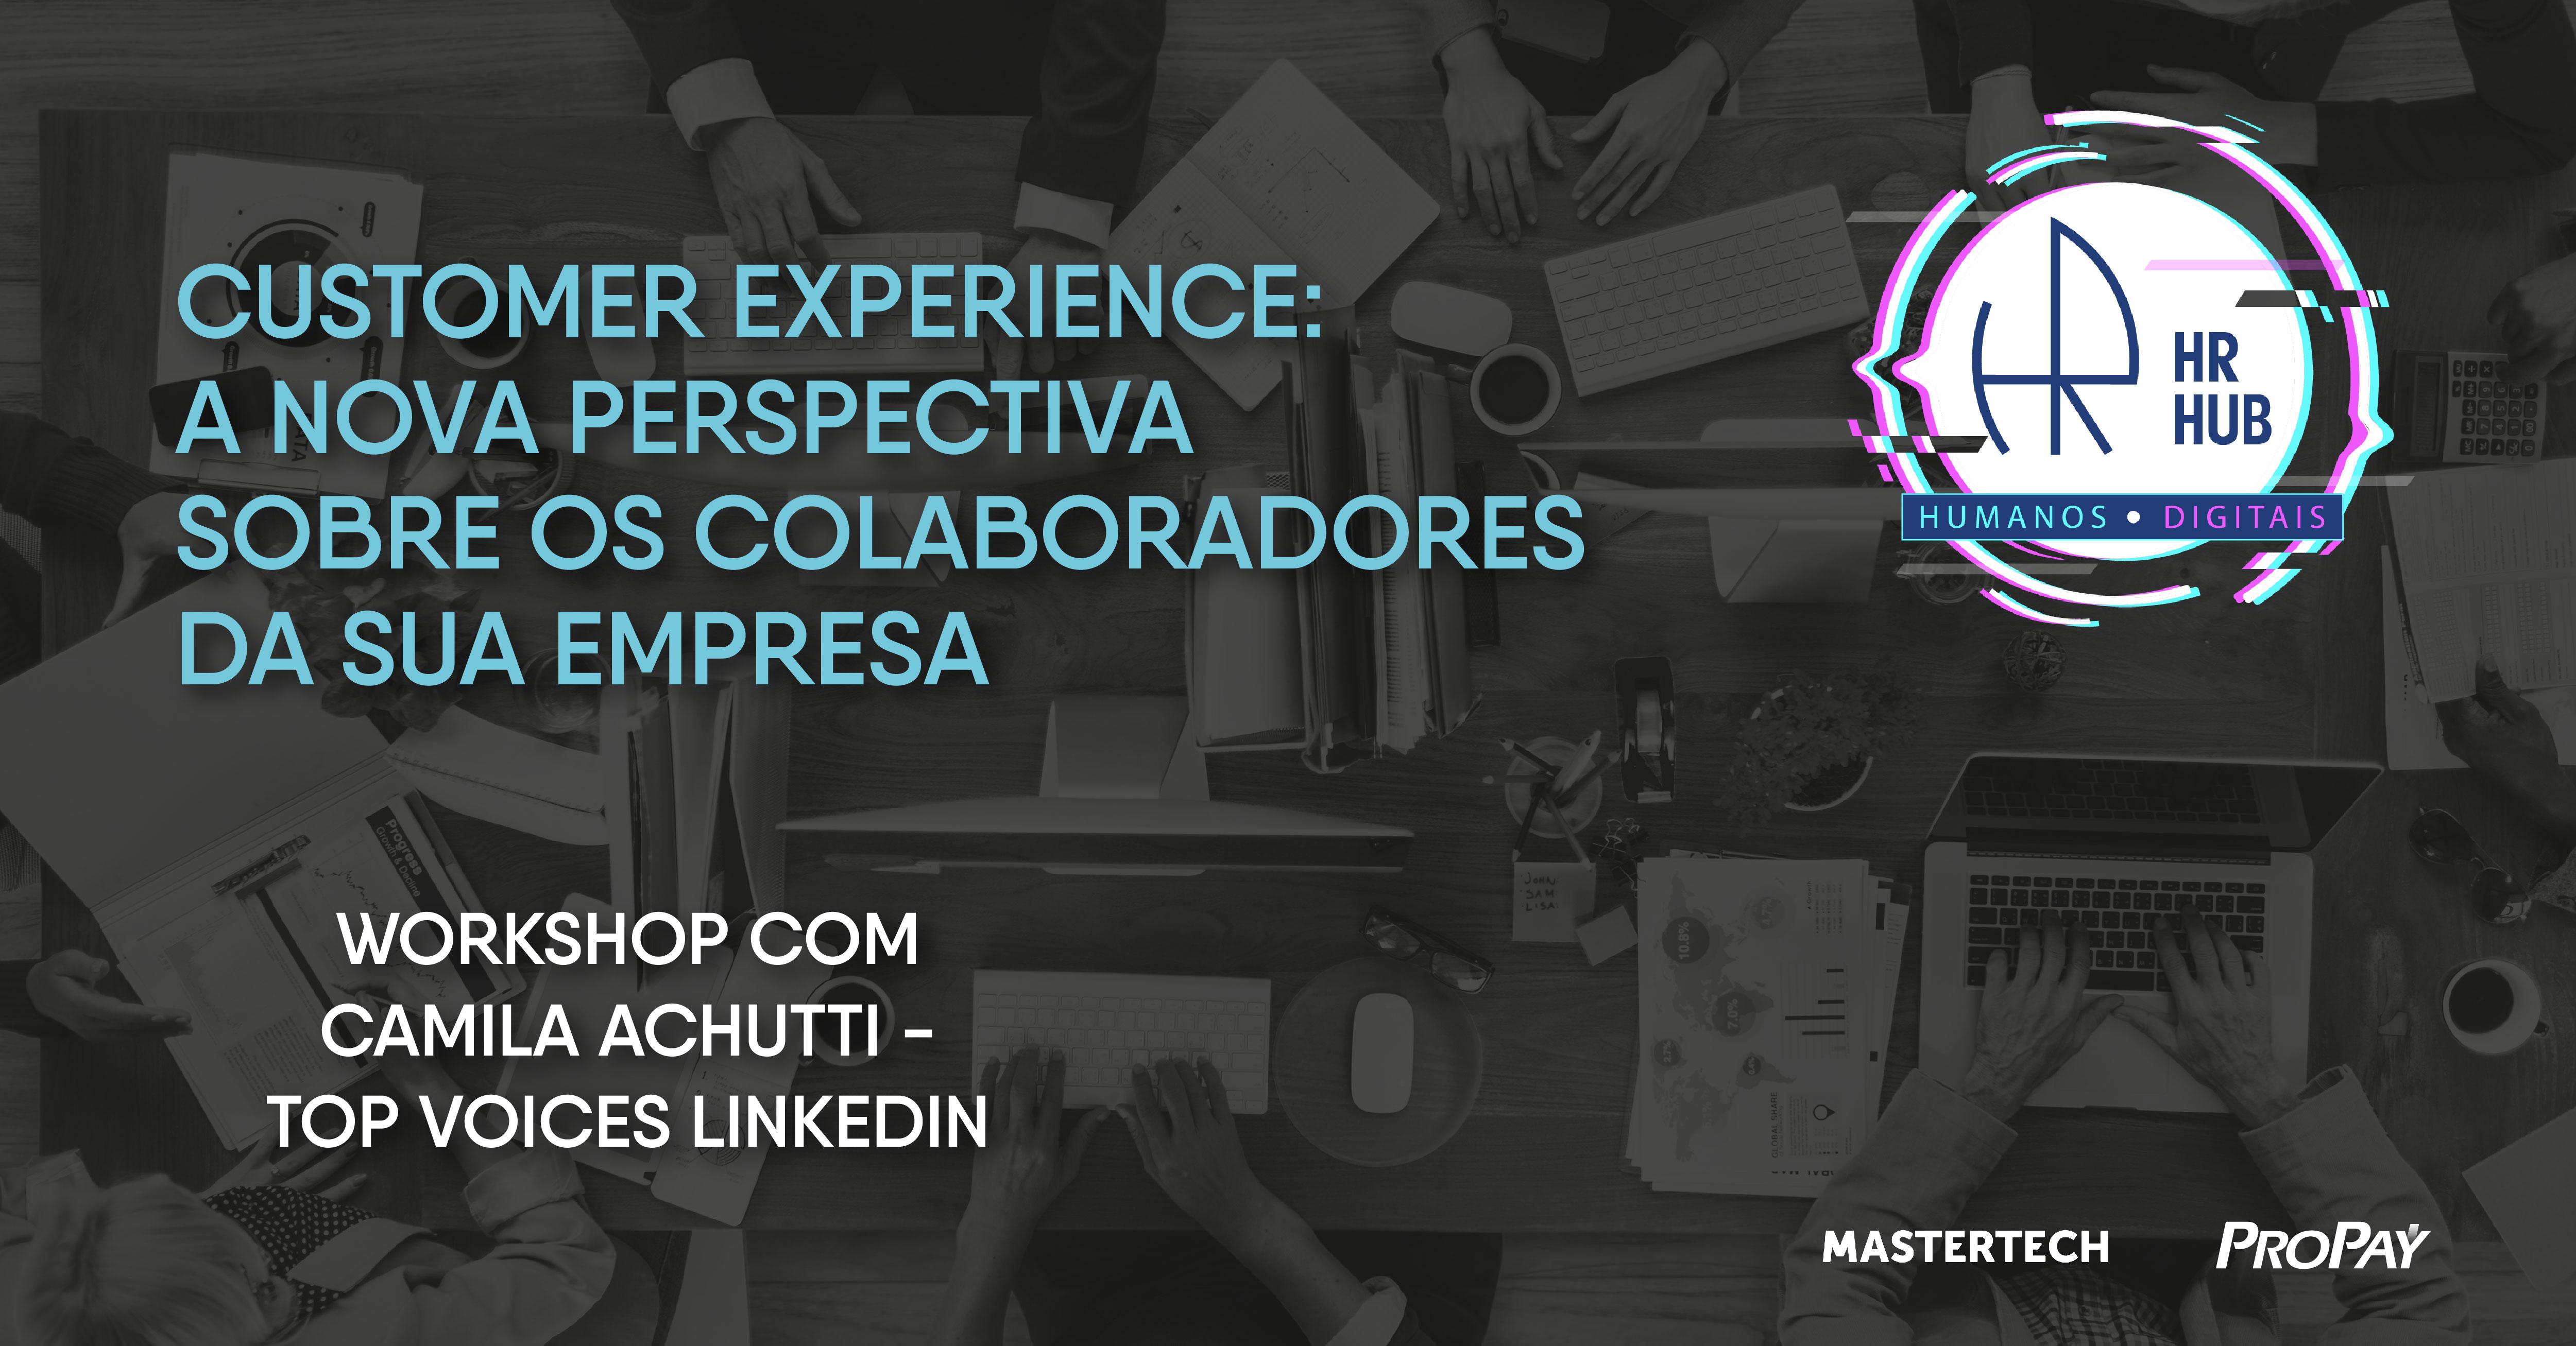 Customer Experience: a nova perspectiva sobre os colaboradores da sua empresa